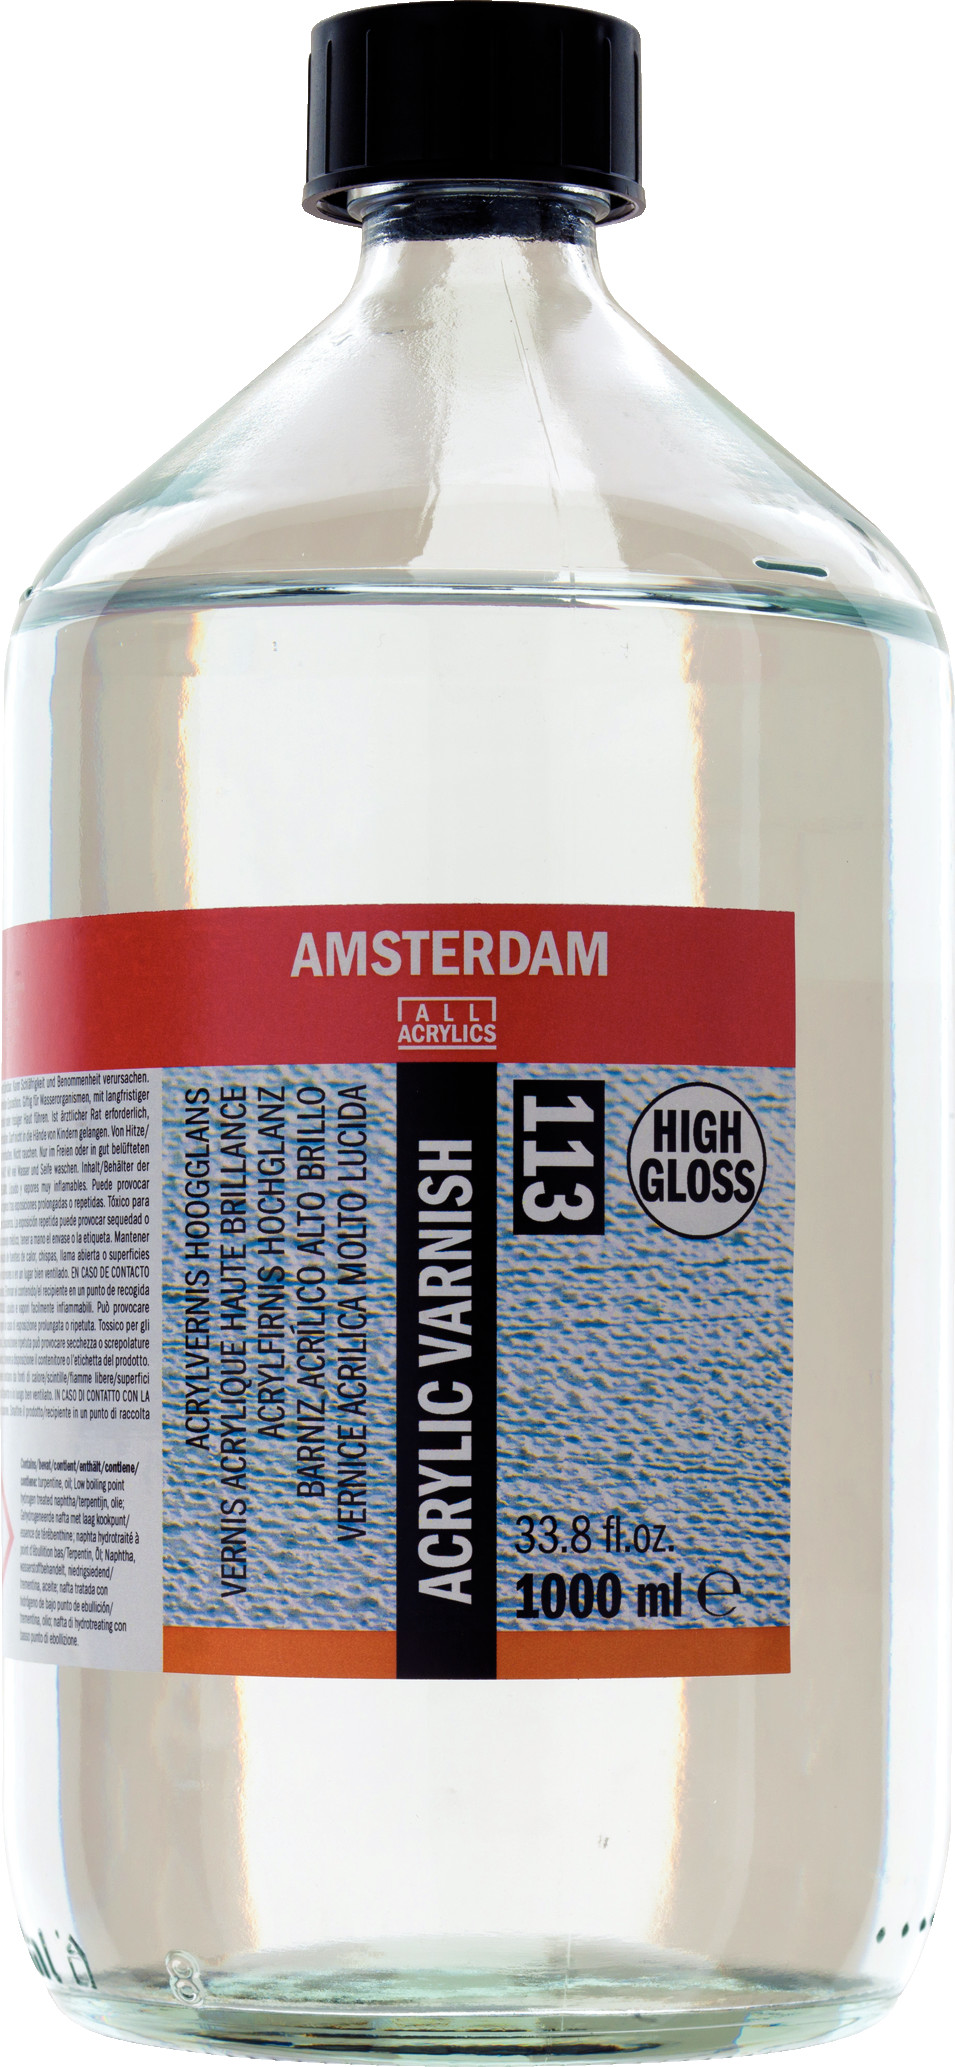 Amsterdam Acrylic Varnish High Gloss Bottle 1000 ml